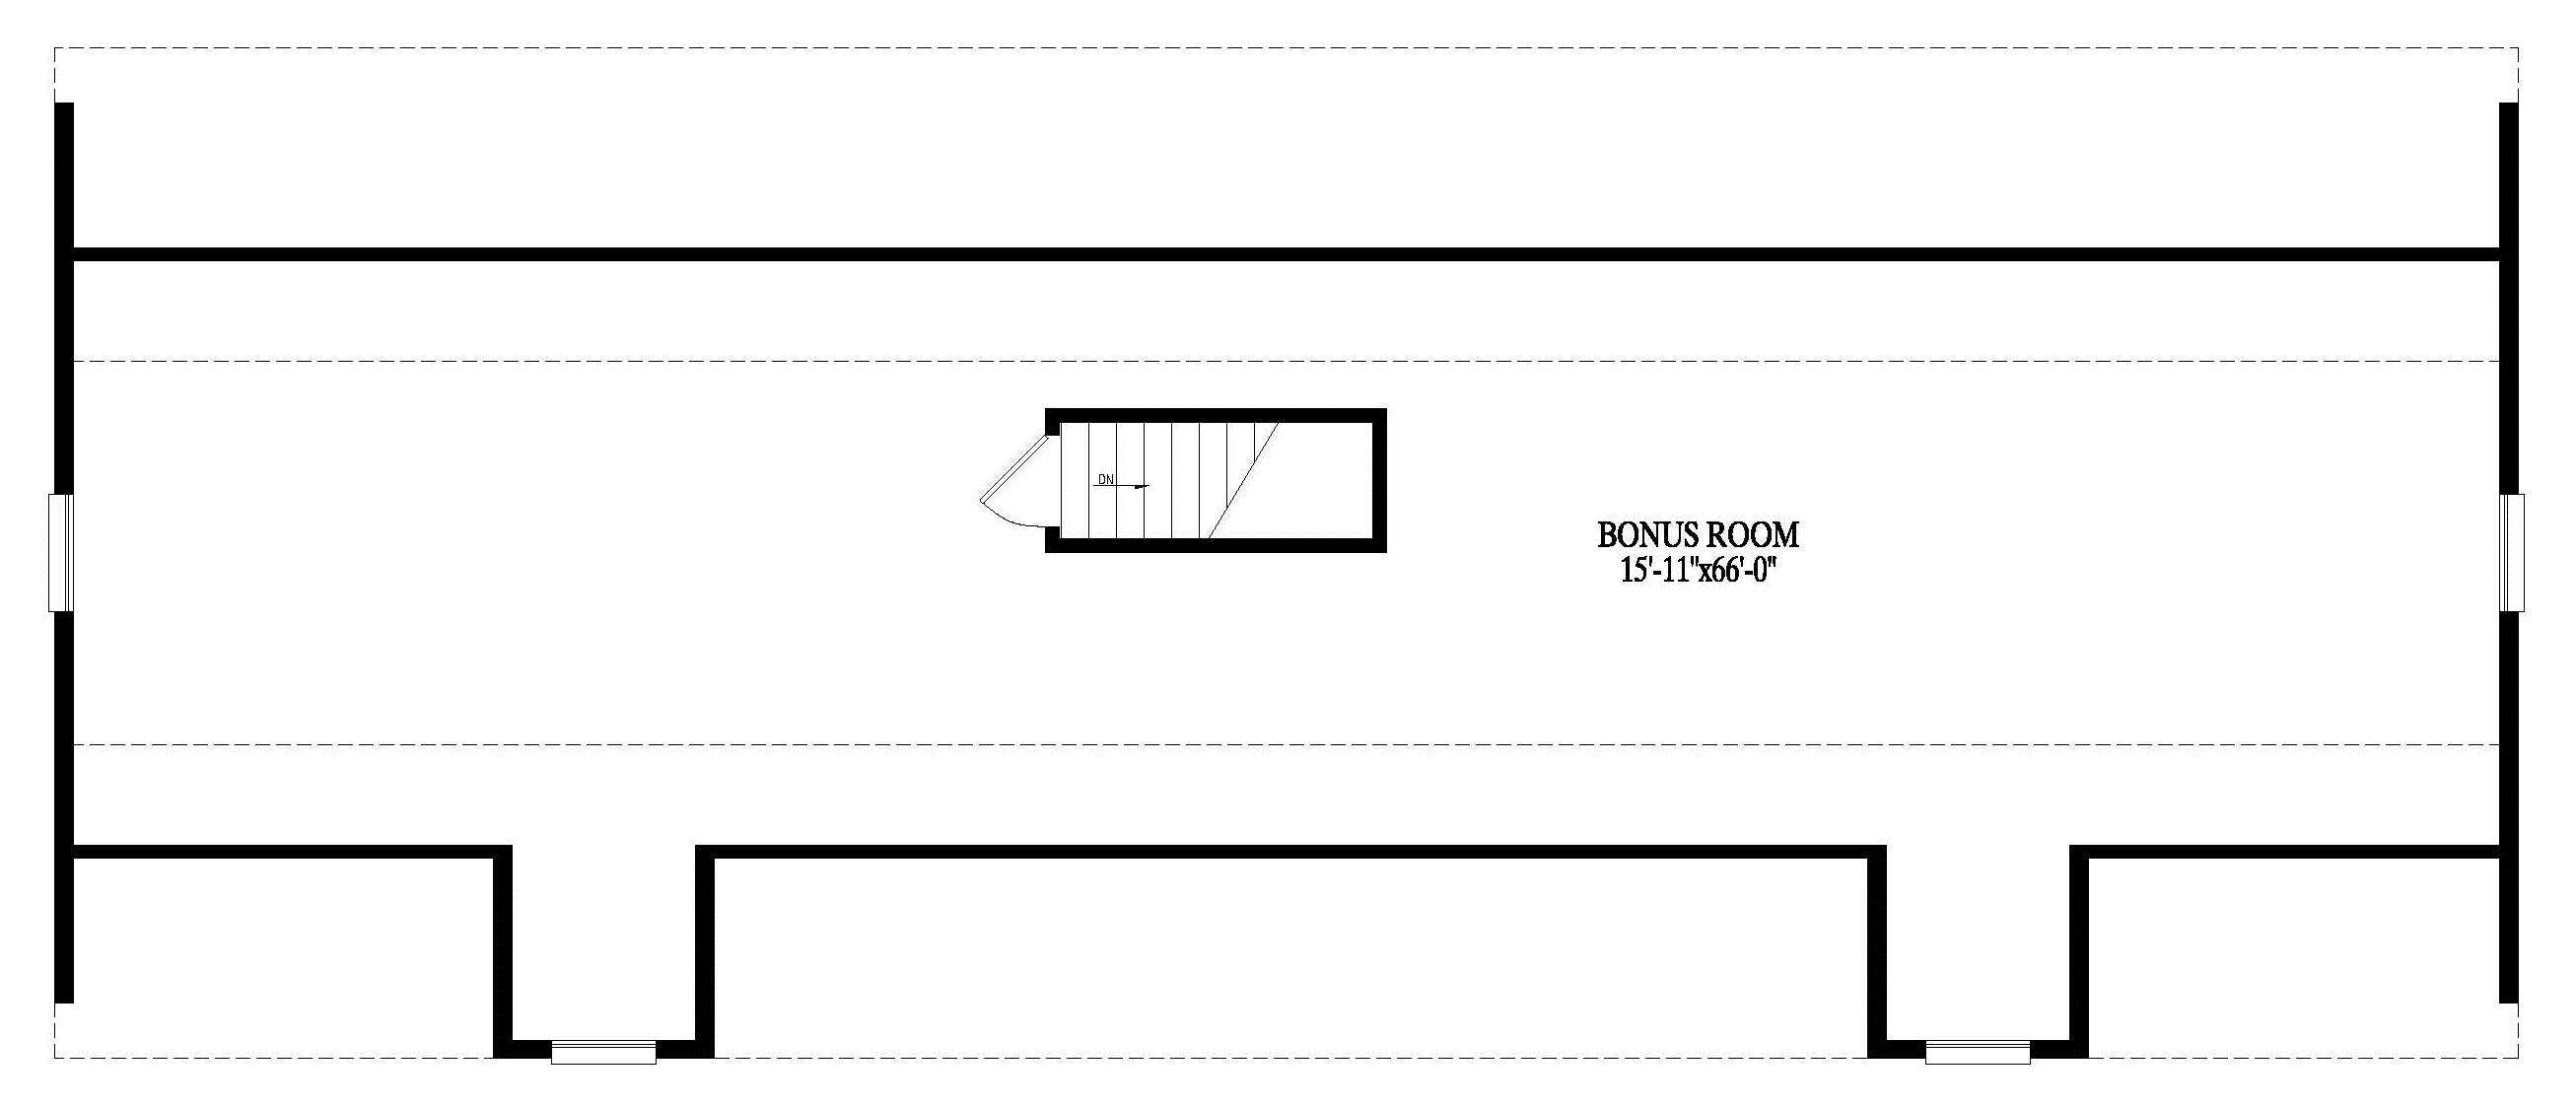 this http://custombuildingsystems.net/wp-content/uploads/2017/12/ONTARIO-Residential-2nd-floor-bonus-area.jpg